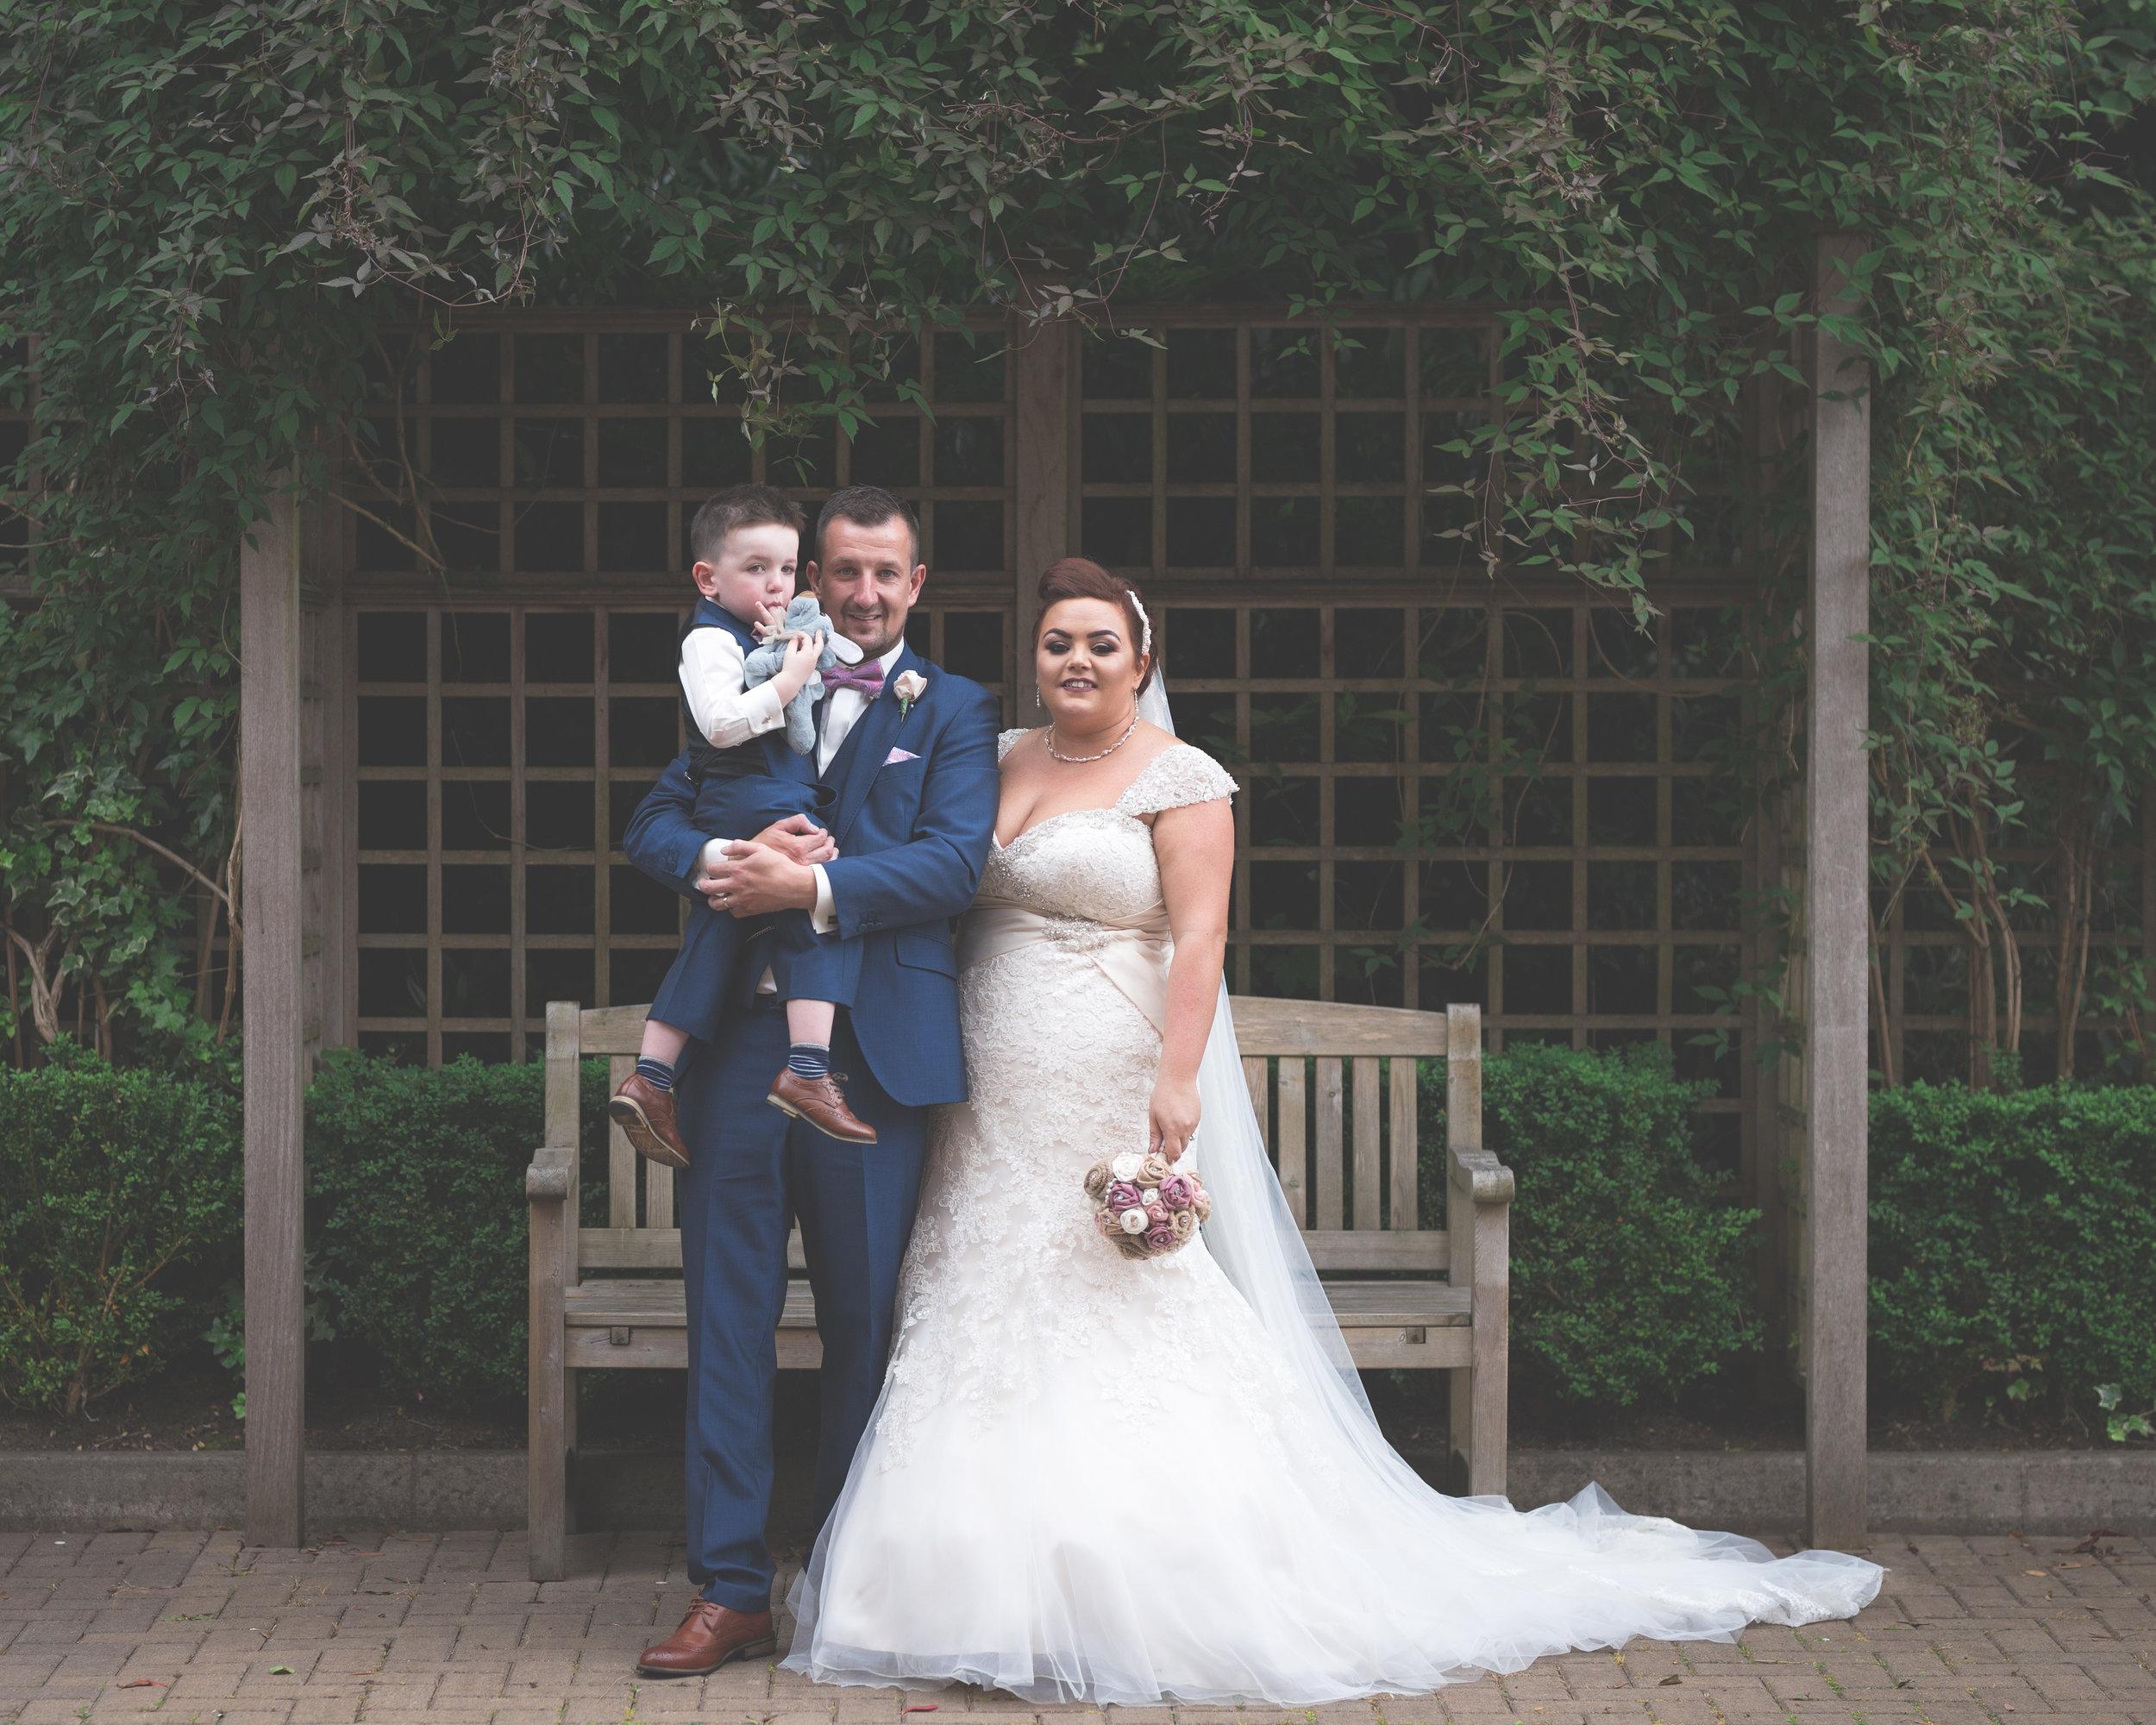 Antoinette & Stephen - Portraits   Brian McEwan Photography   Wedding Photographer Northern Ireland 48.jpg